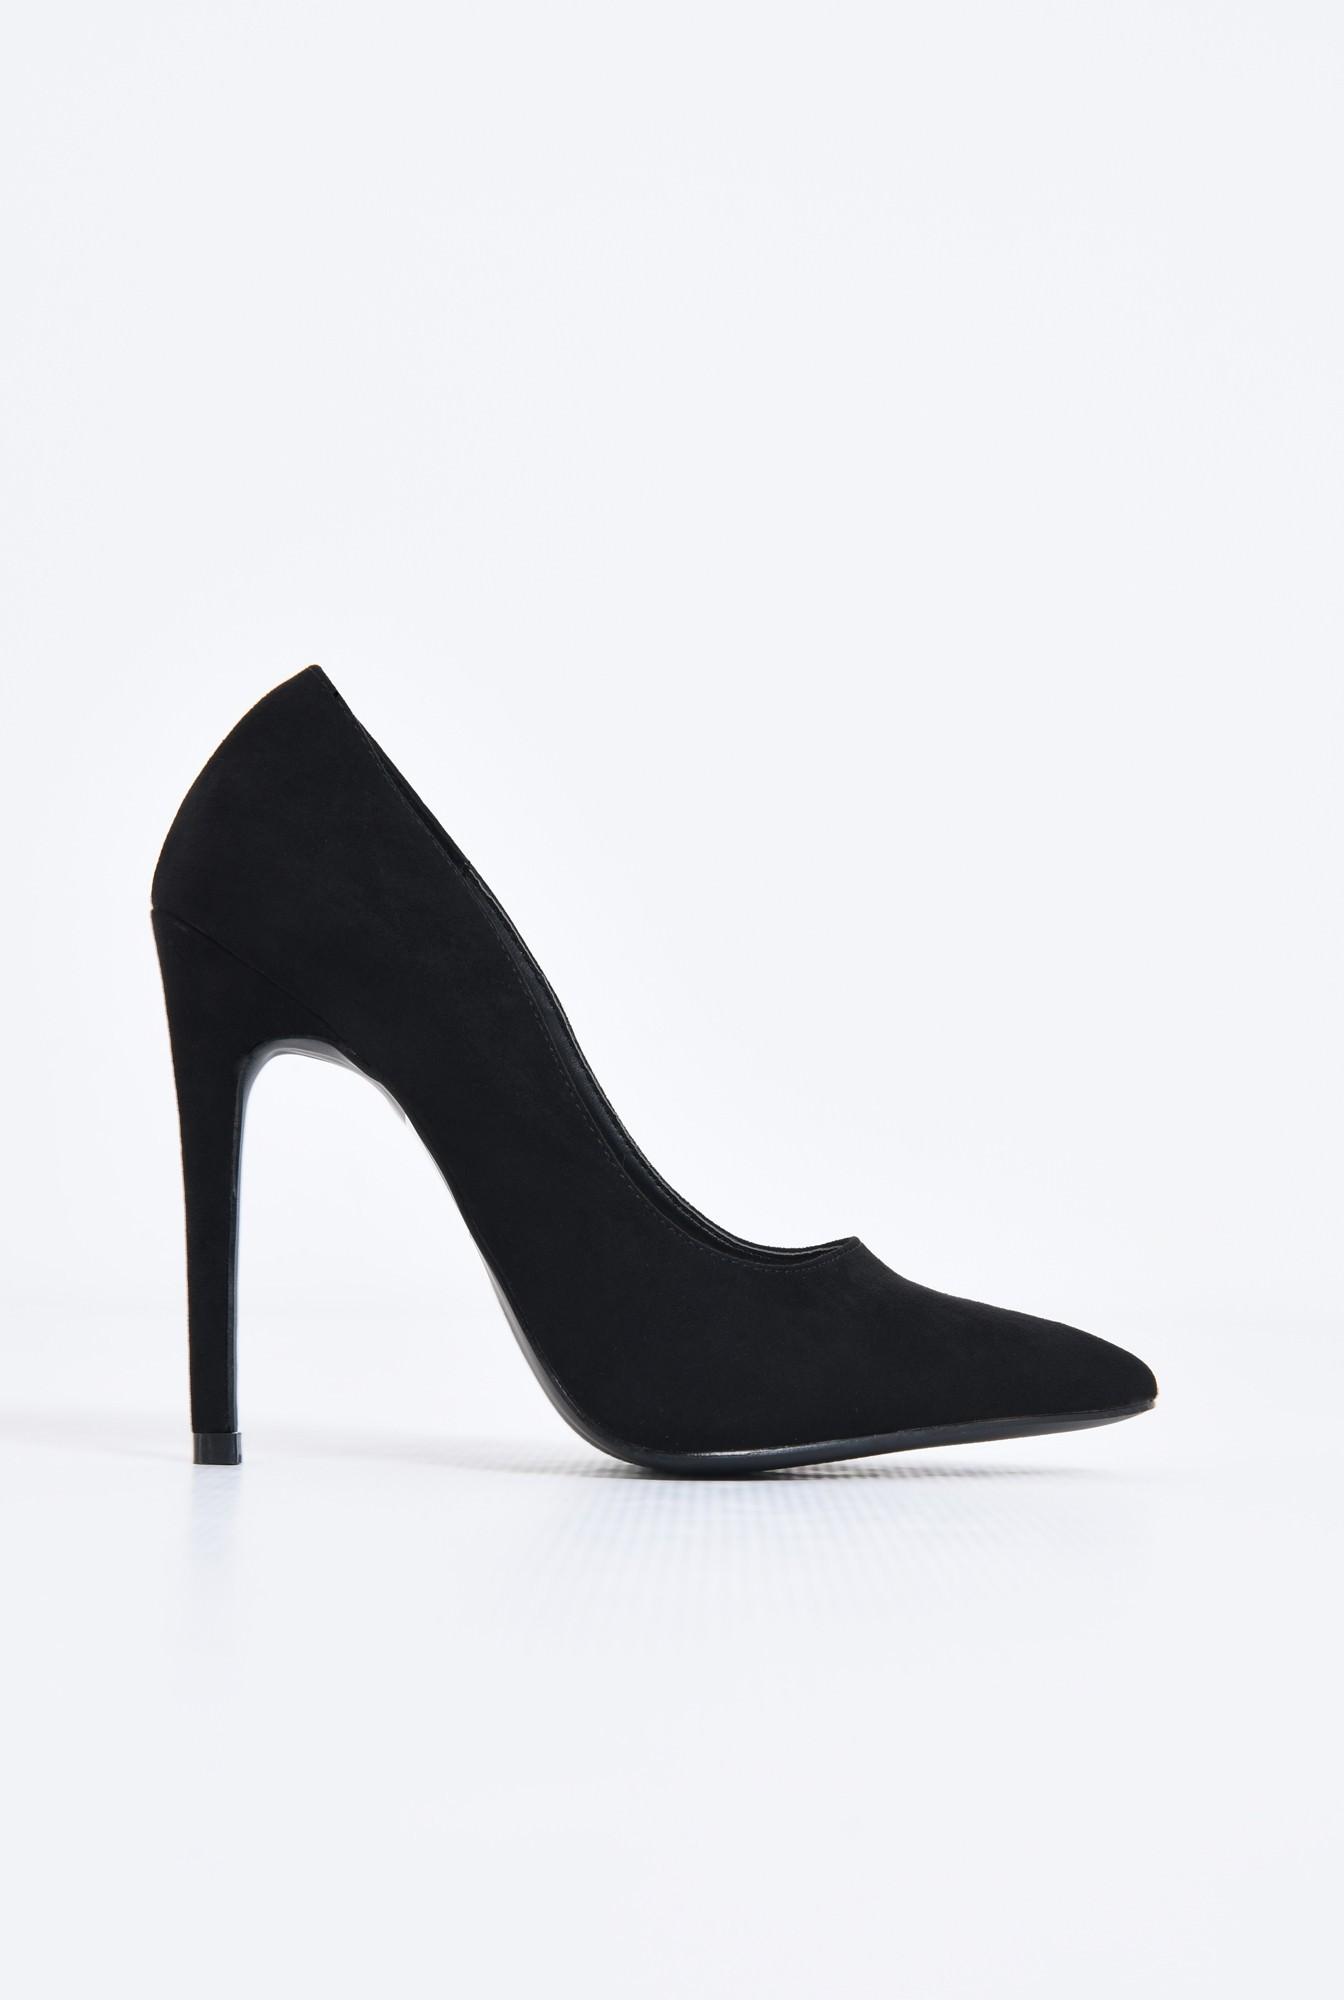 0 - pantofi de ocazie, varf ascutit, toc inalt